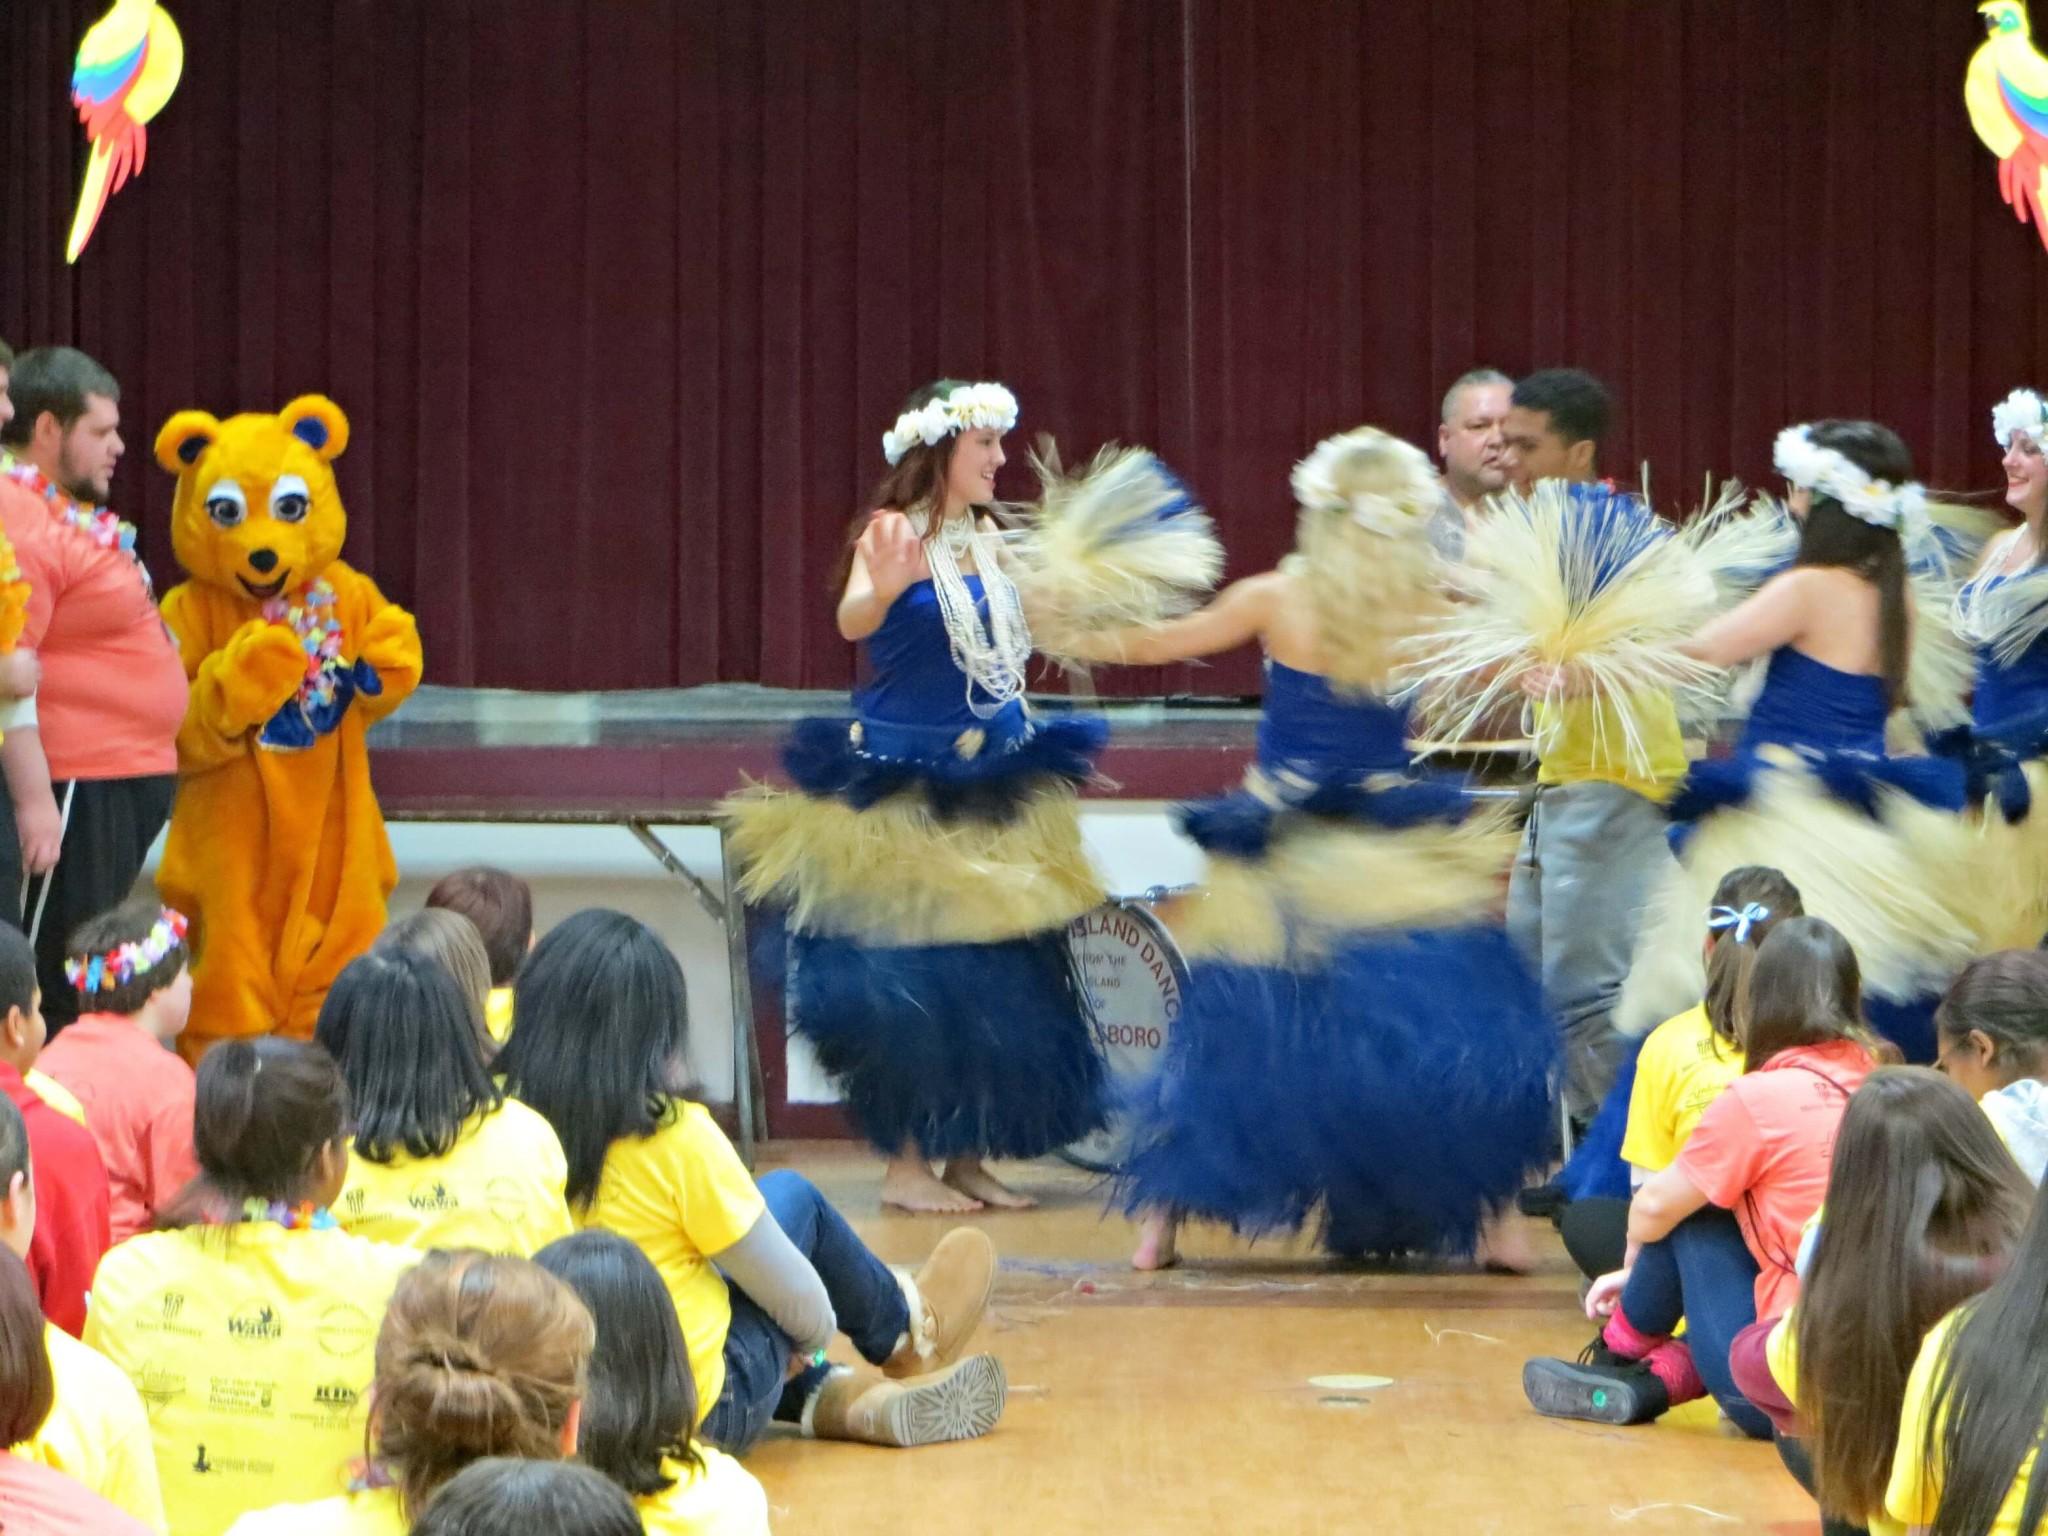 East Falls Local -- polynesian dancing close motion blur